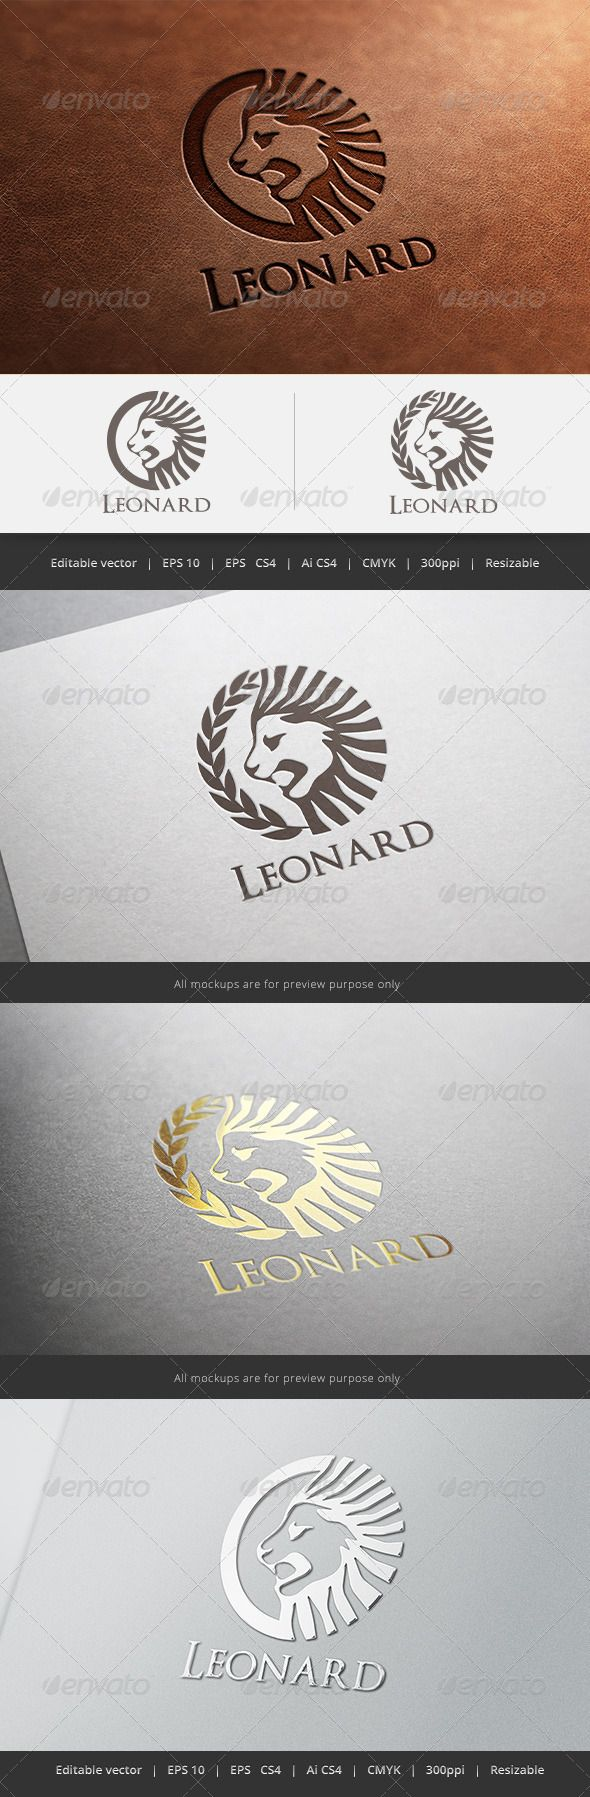 Leonard Lion Logo — Vector EPS #Leonard #solid • Available here → https://graphicriver.net/item/leonard-lion-logo/5596891?ref=pxcr